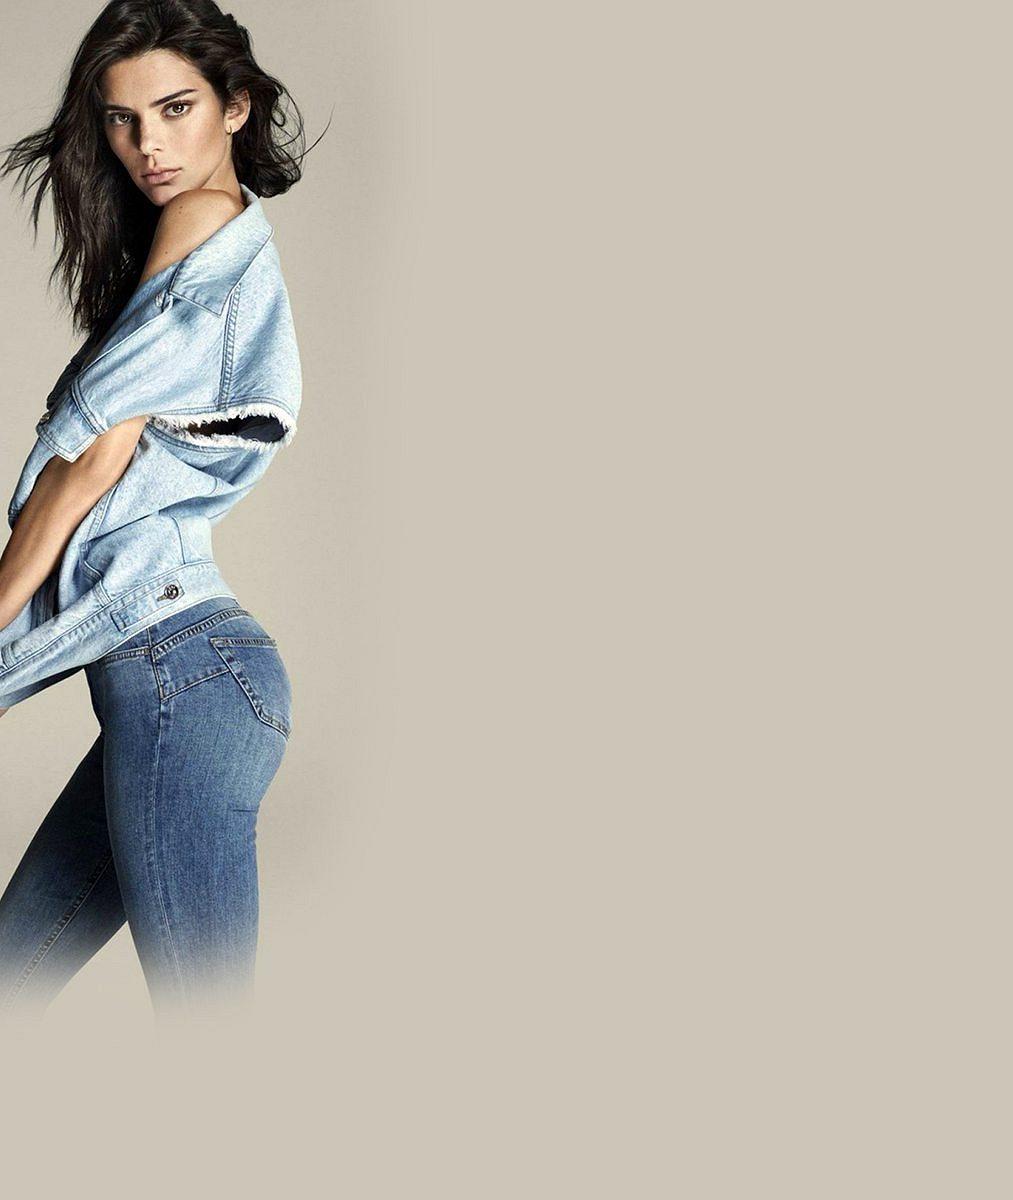 Kendall Jenner se pochlubila fotkou vkrajkovém prádle: Reagovala na ni imanželka Justina Biebera